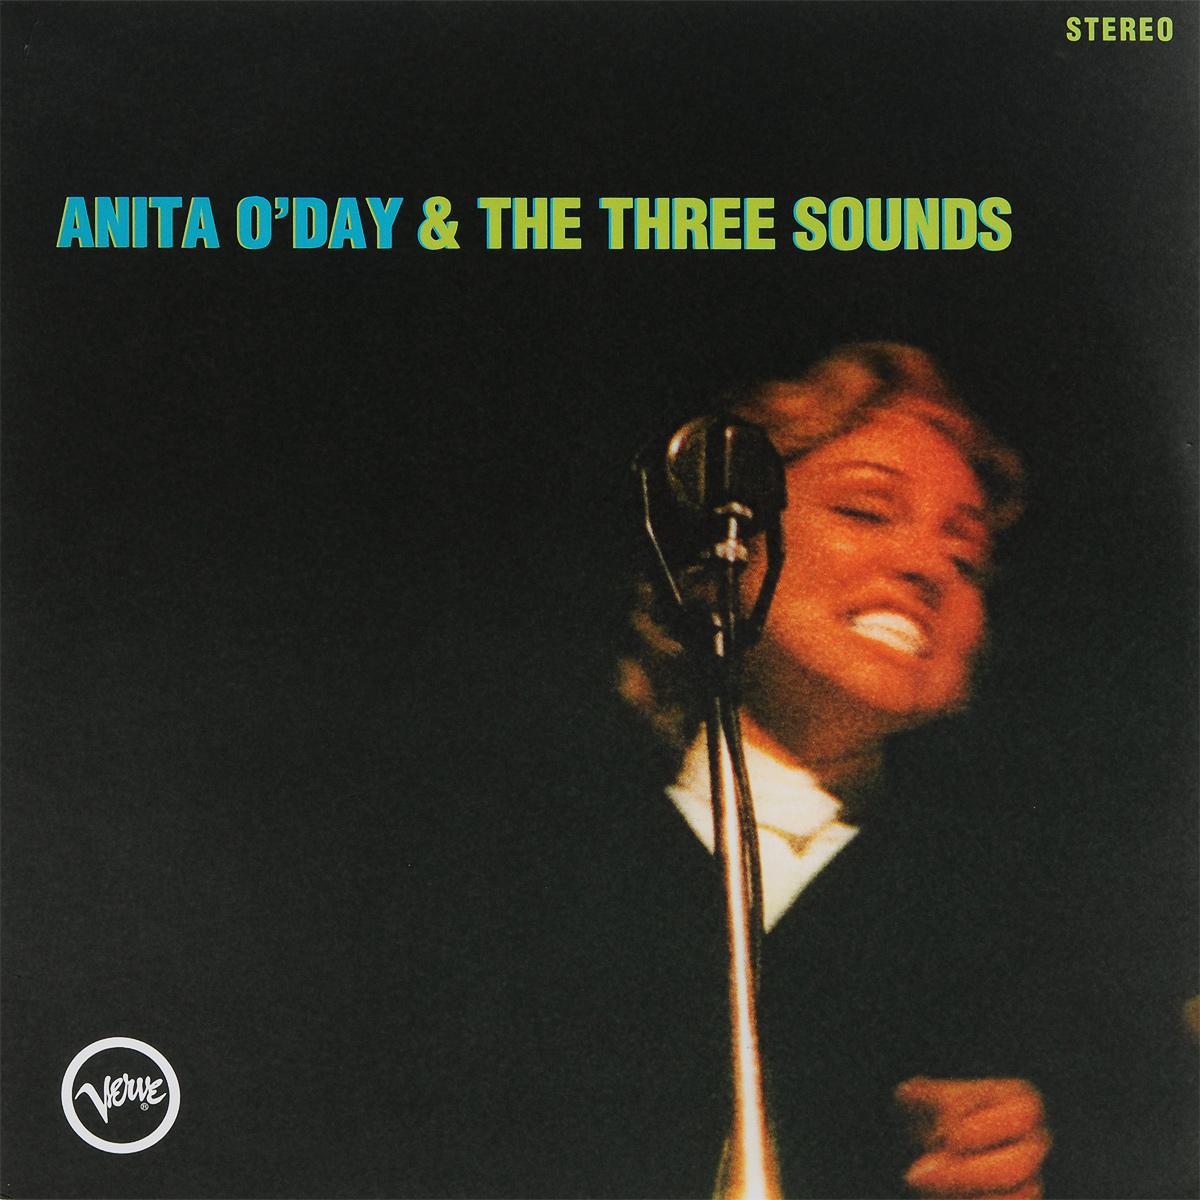 Anita O'Day & The Three Sounds (LP)